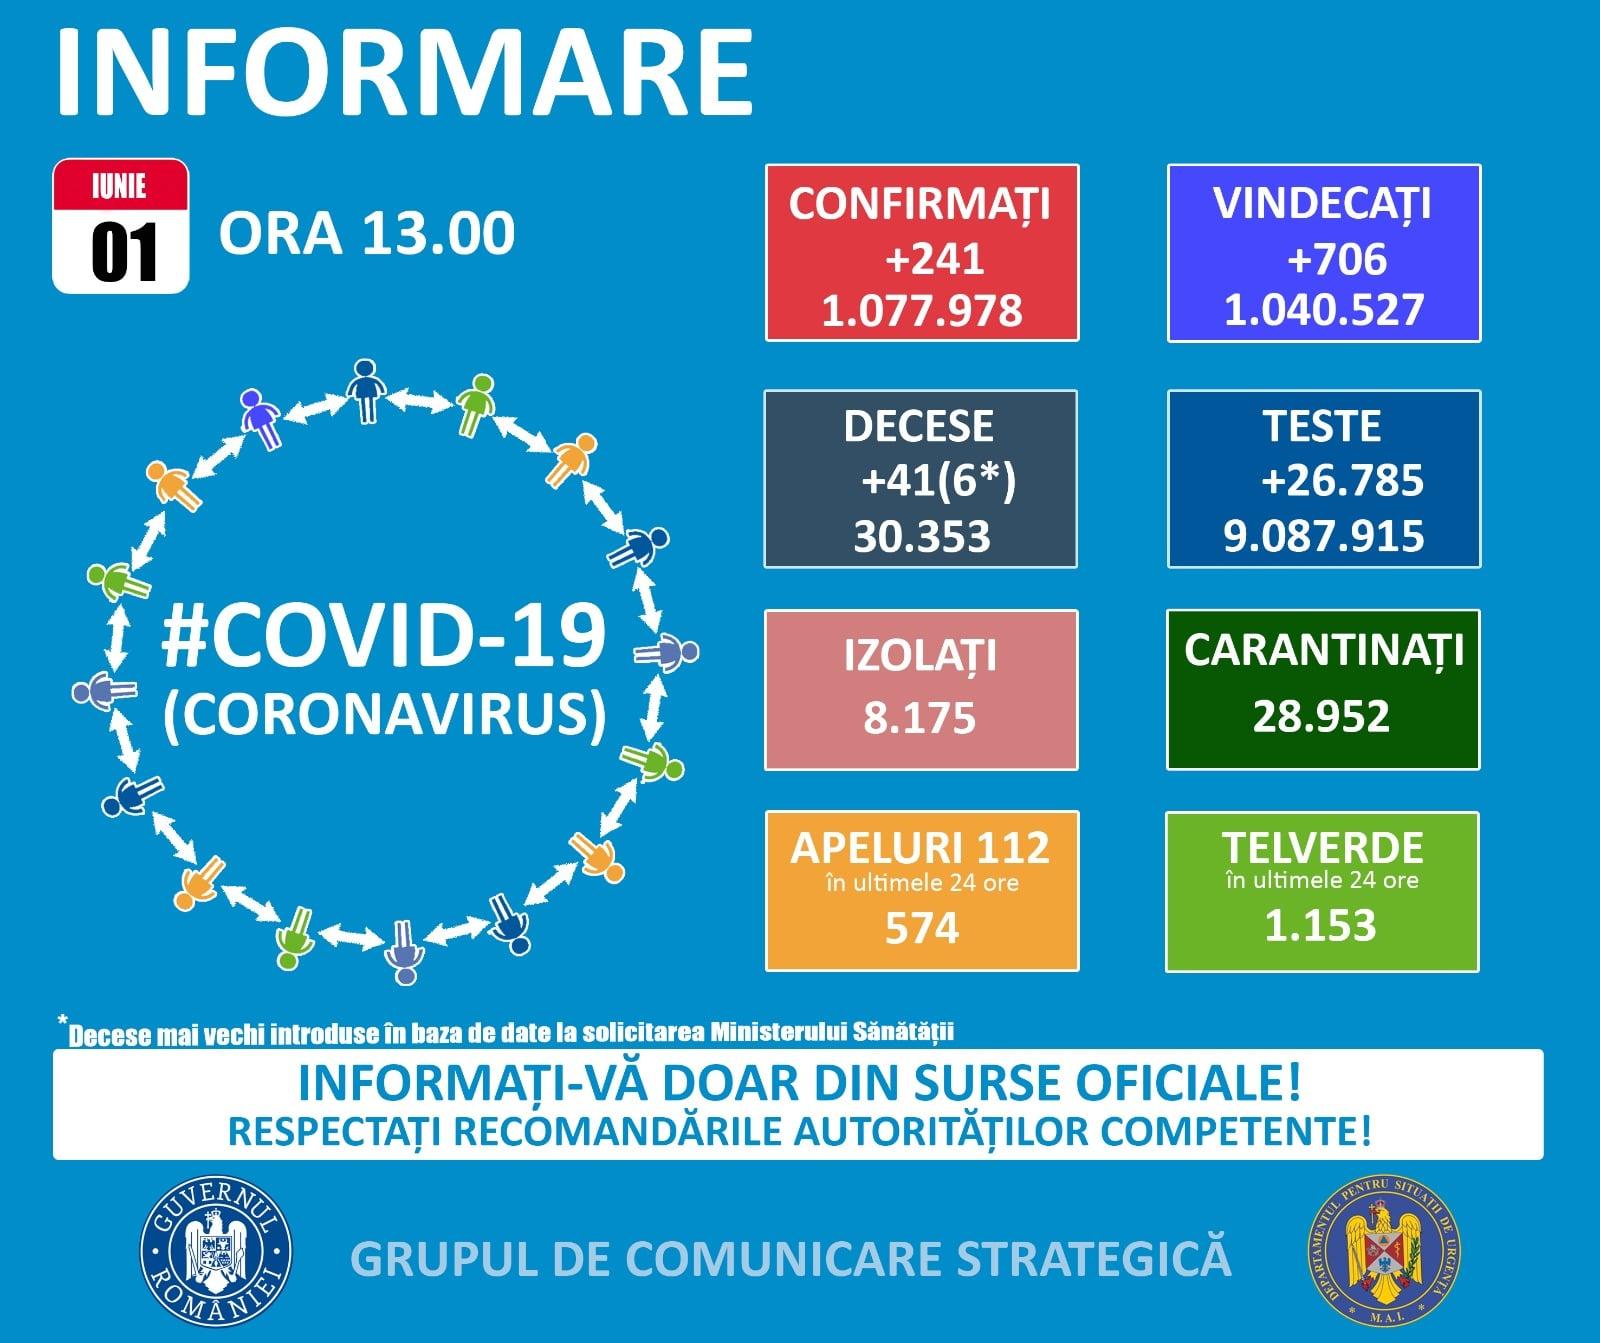 Informare SARS-CoV-2, 01 iunie 2021